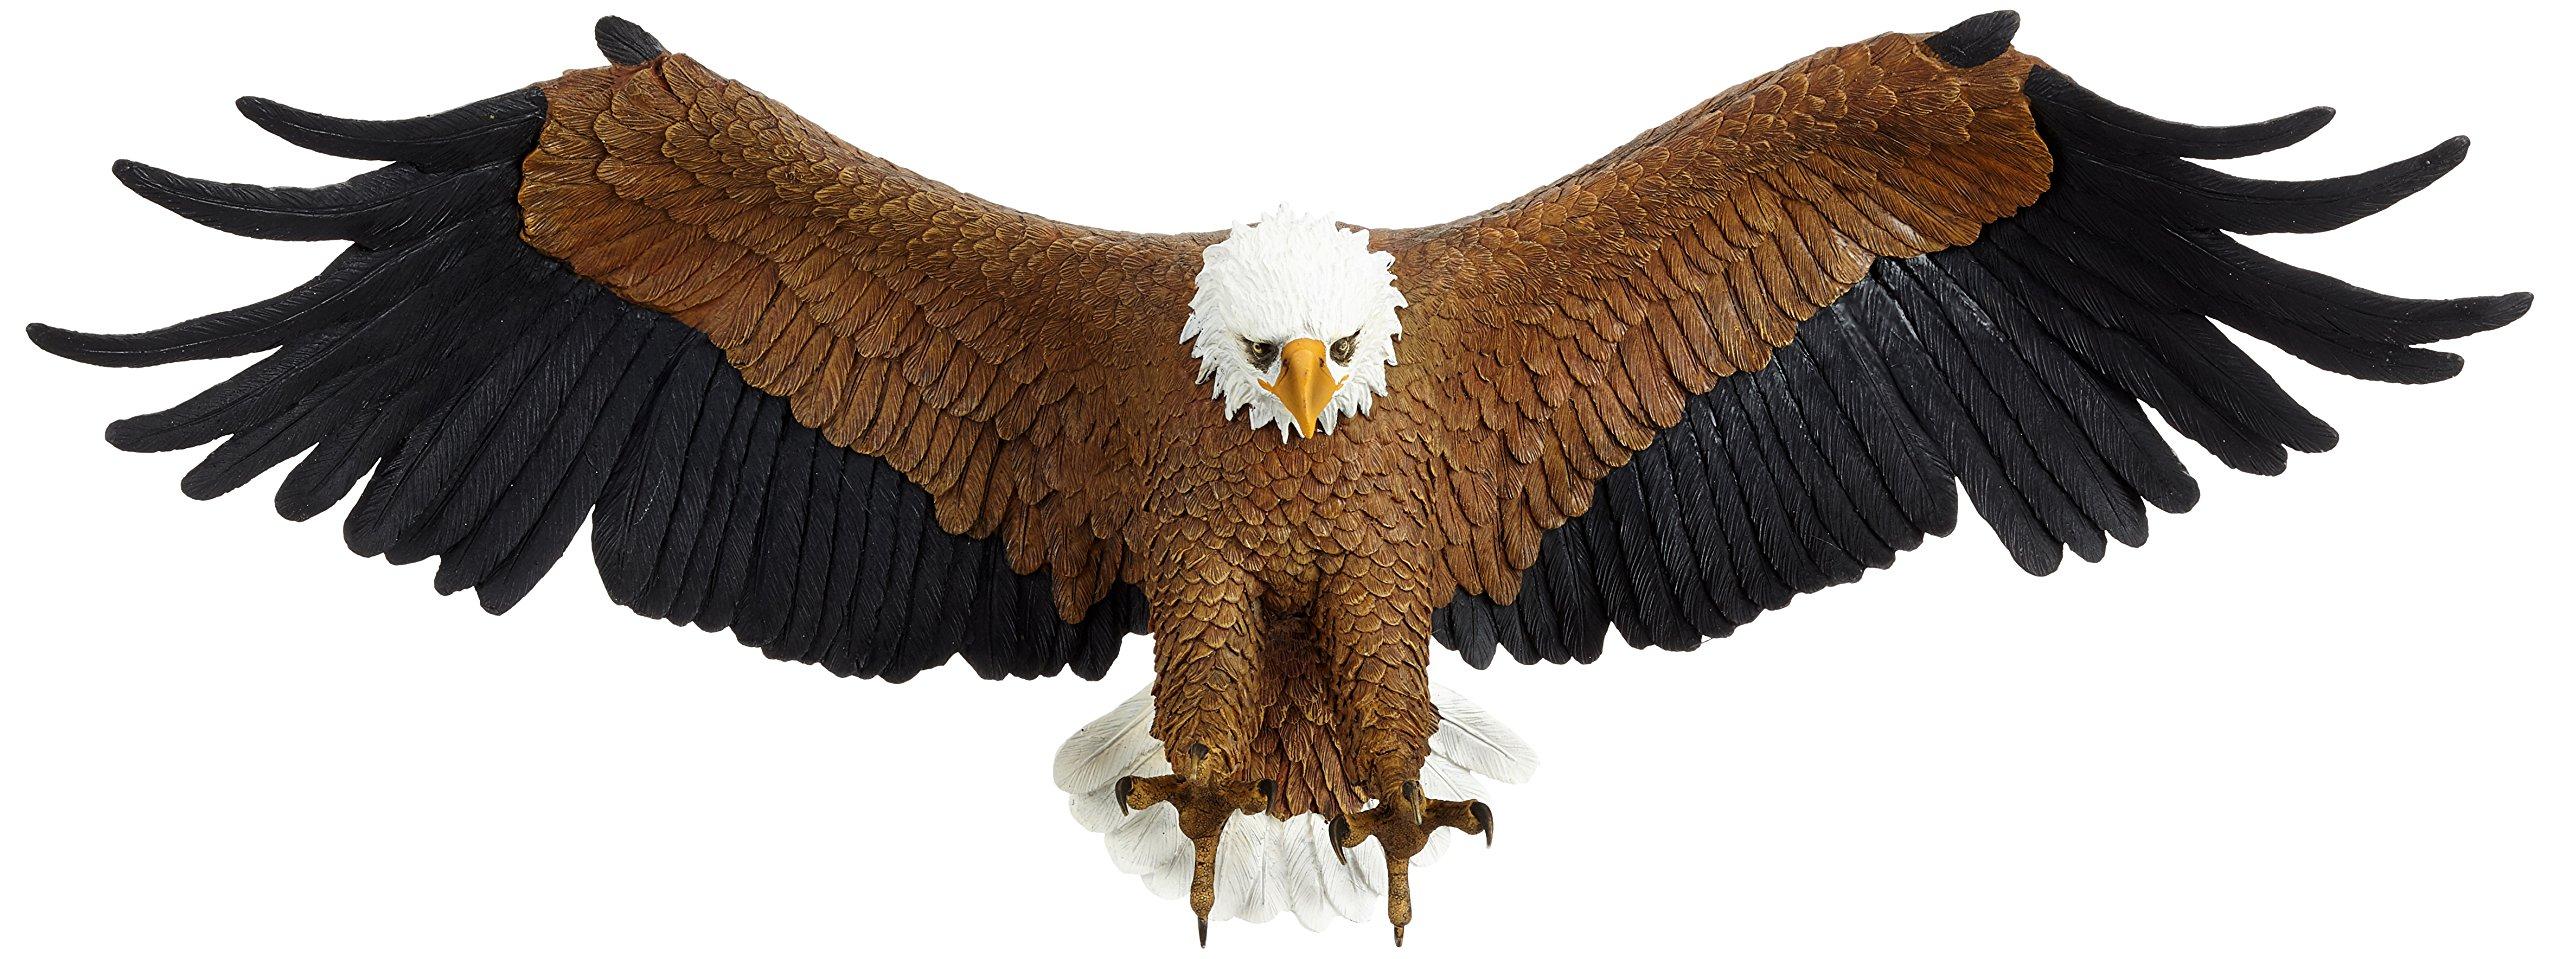 Design Toscano Freedom's Pride American Eagle Wall Sculpture